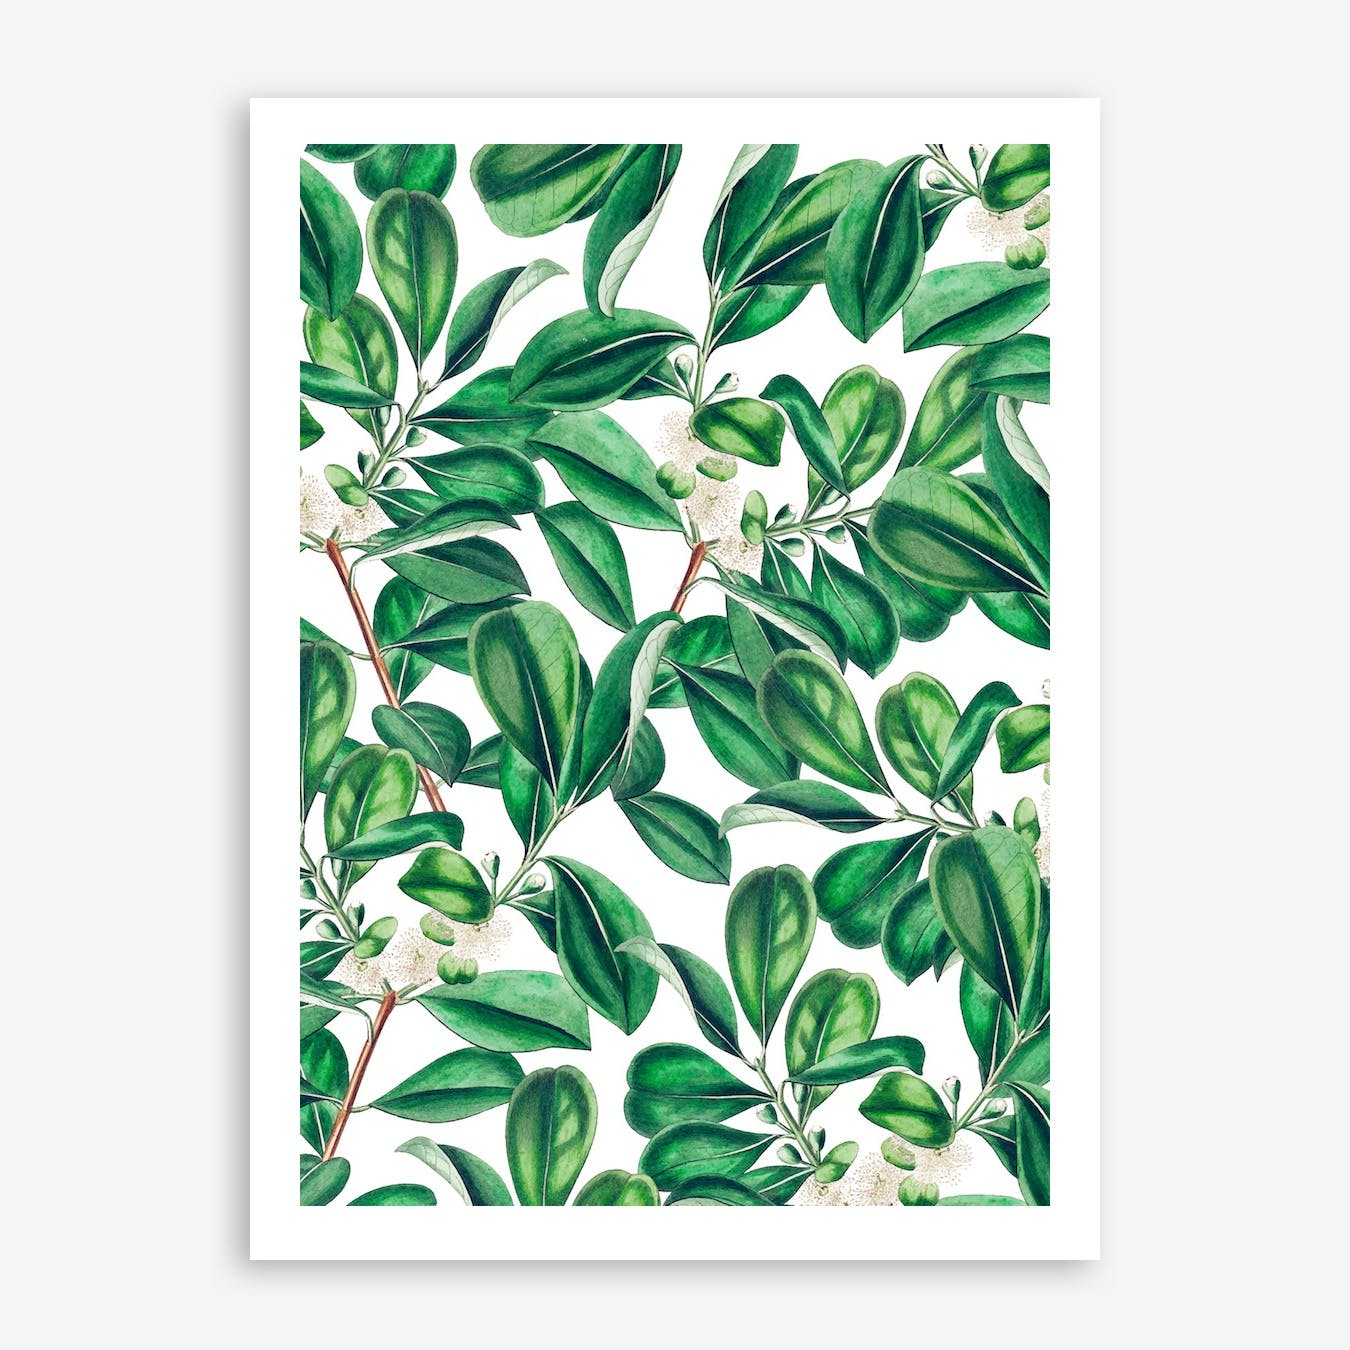 Botanica In Print